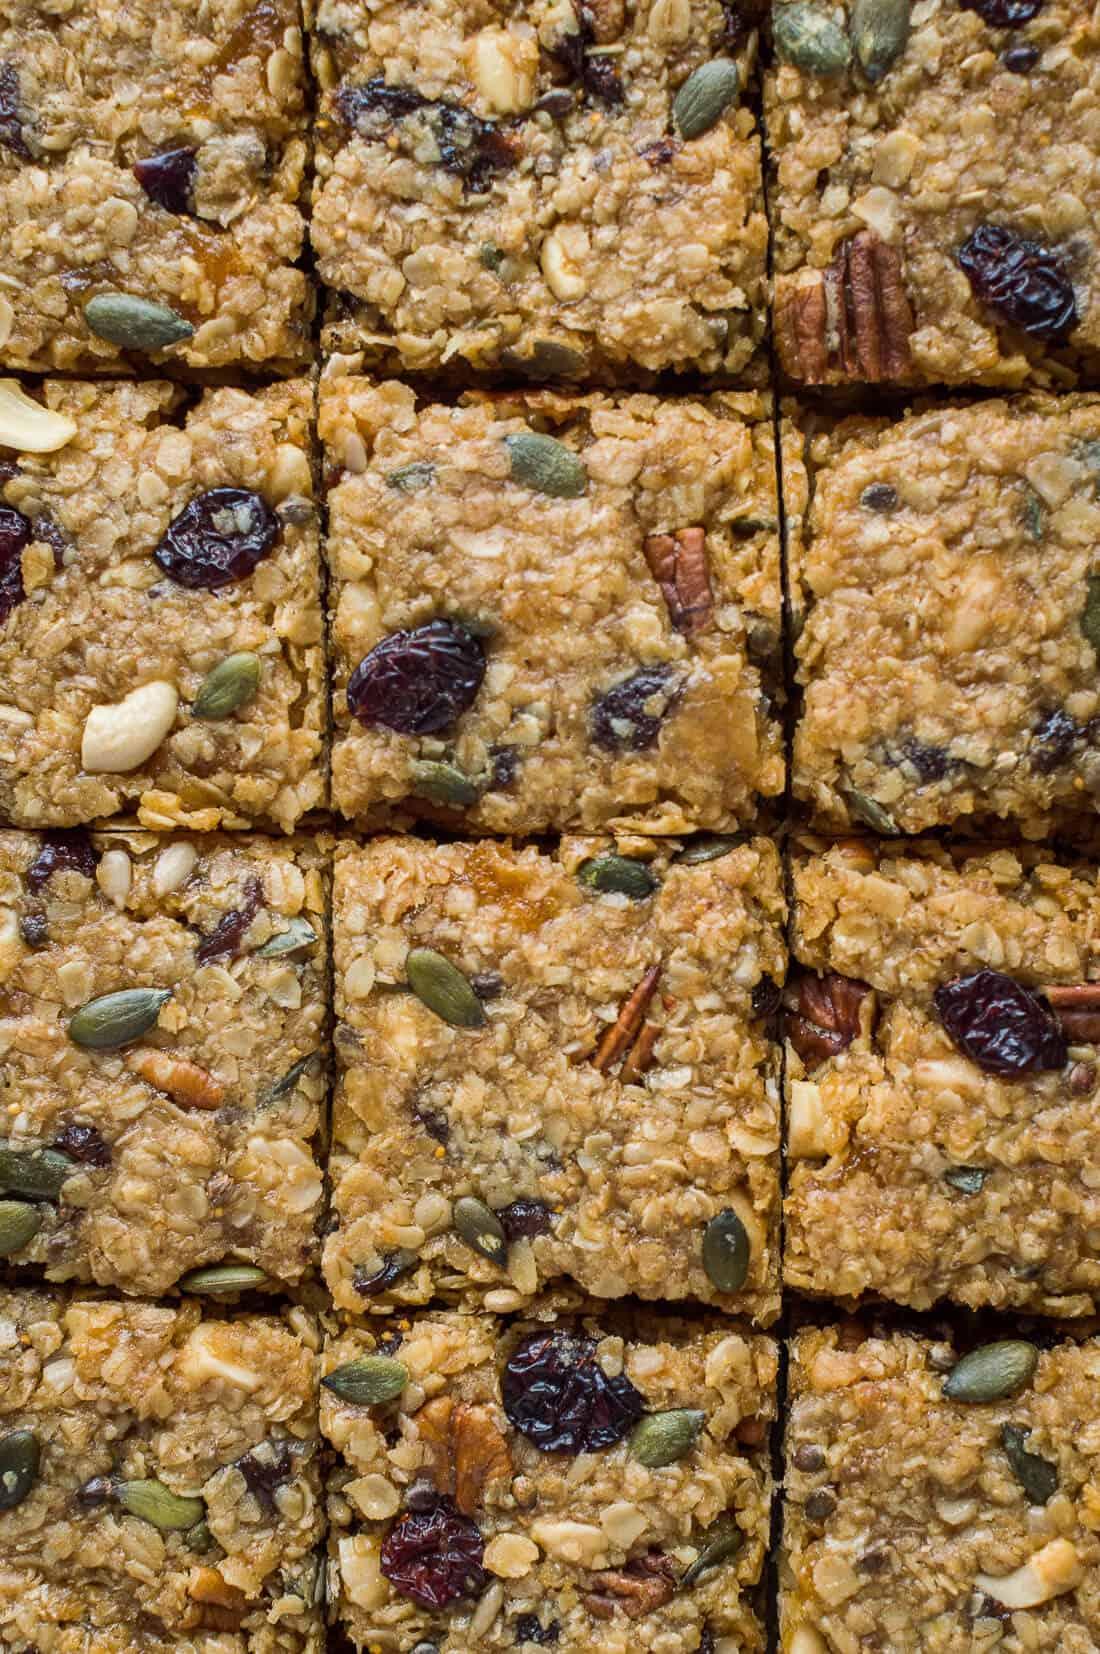 Close-up of squares of vegan fruit and nut flapjacks